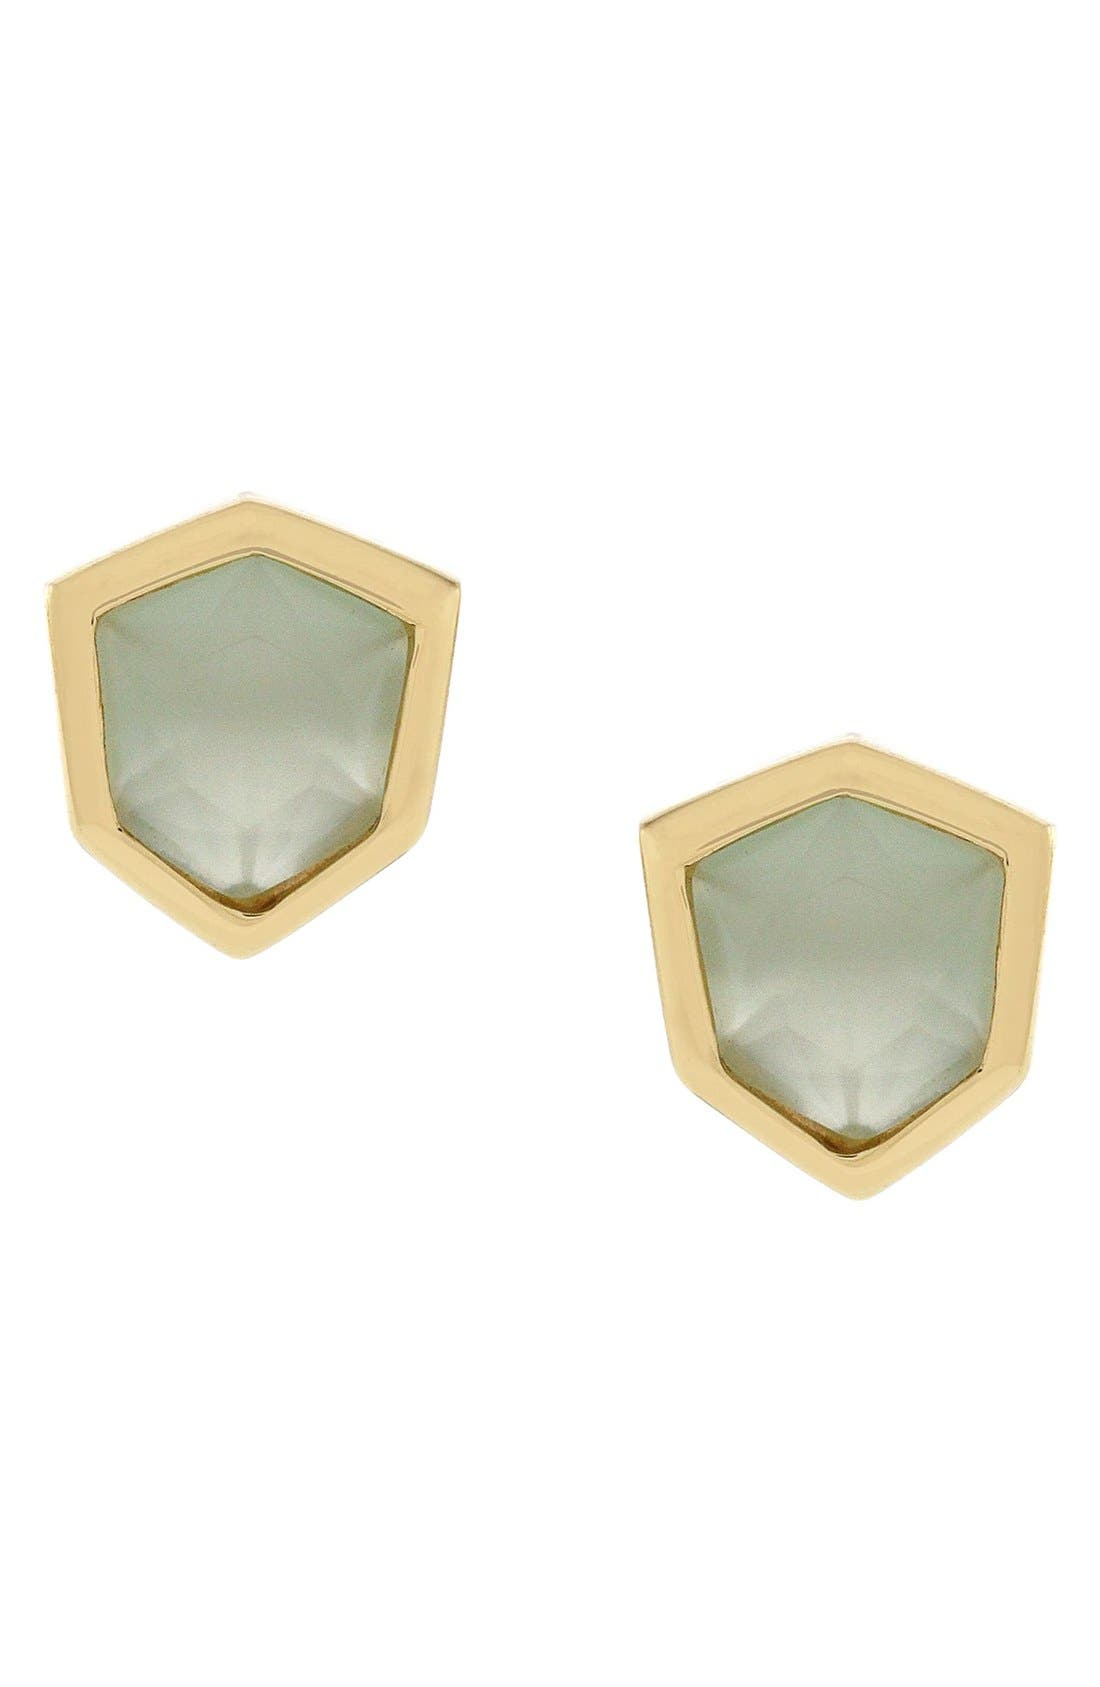 Crystal Stud Earrings,                             Main thumbnail 1, color,                             440